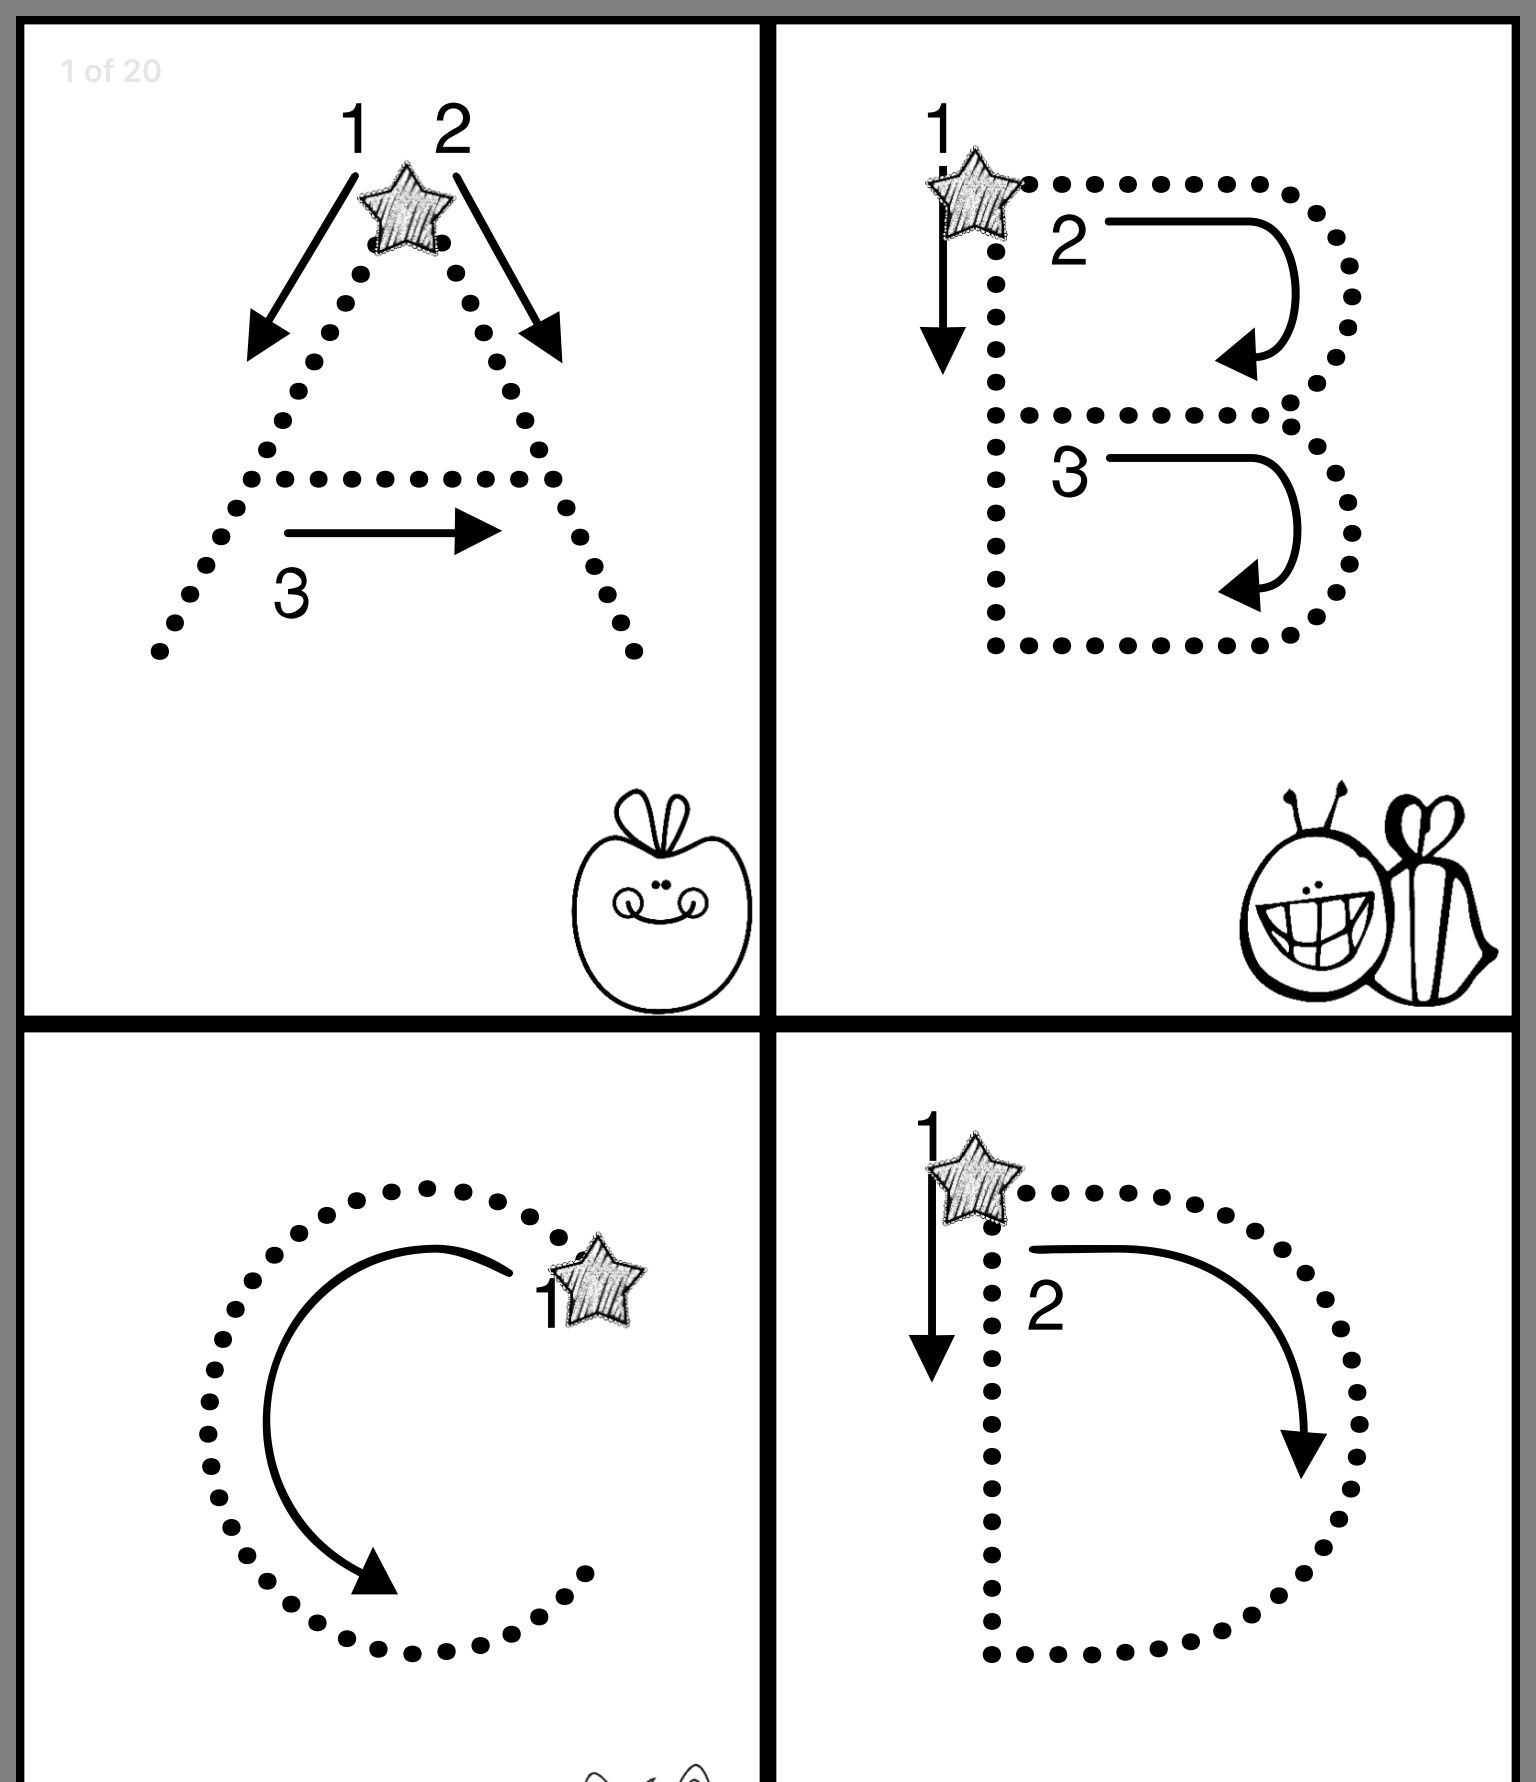 Pin By Tracie Tatum Blakeney On Alphabet Preschool